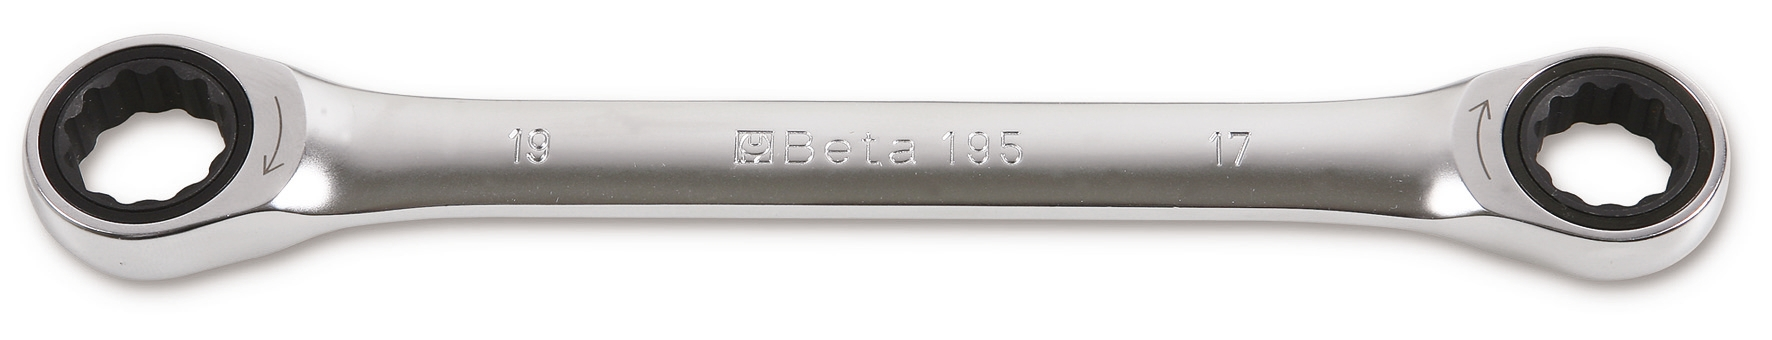 Chiavi poligonali 195 - BETA Utensili